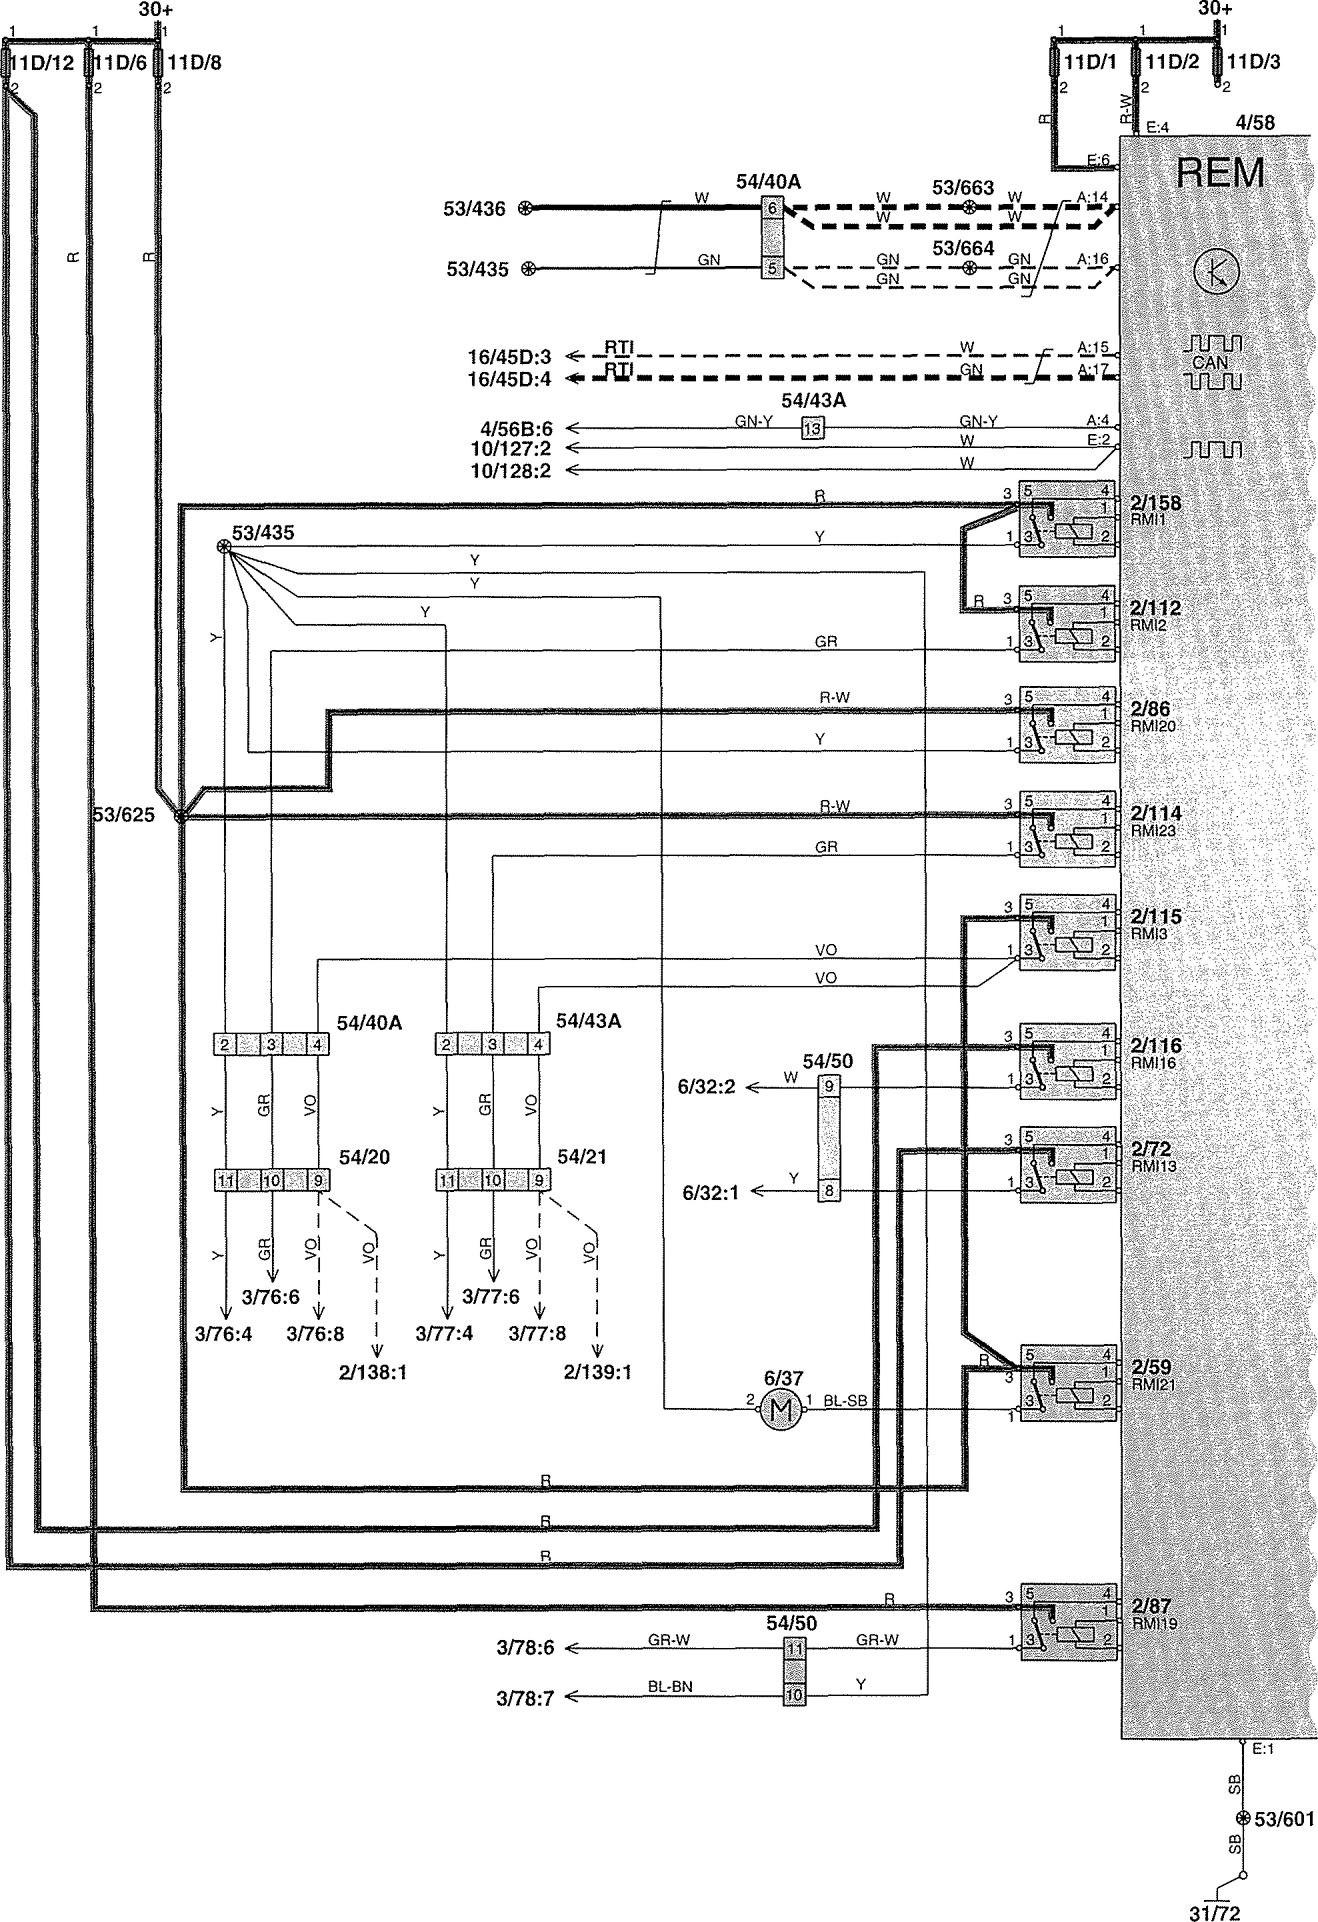 2001 Volvo V70 Wiring Diagram from i1.wp.com